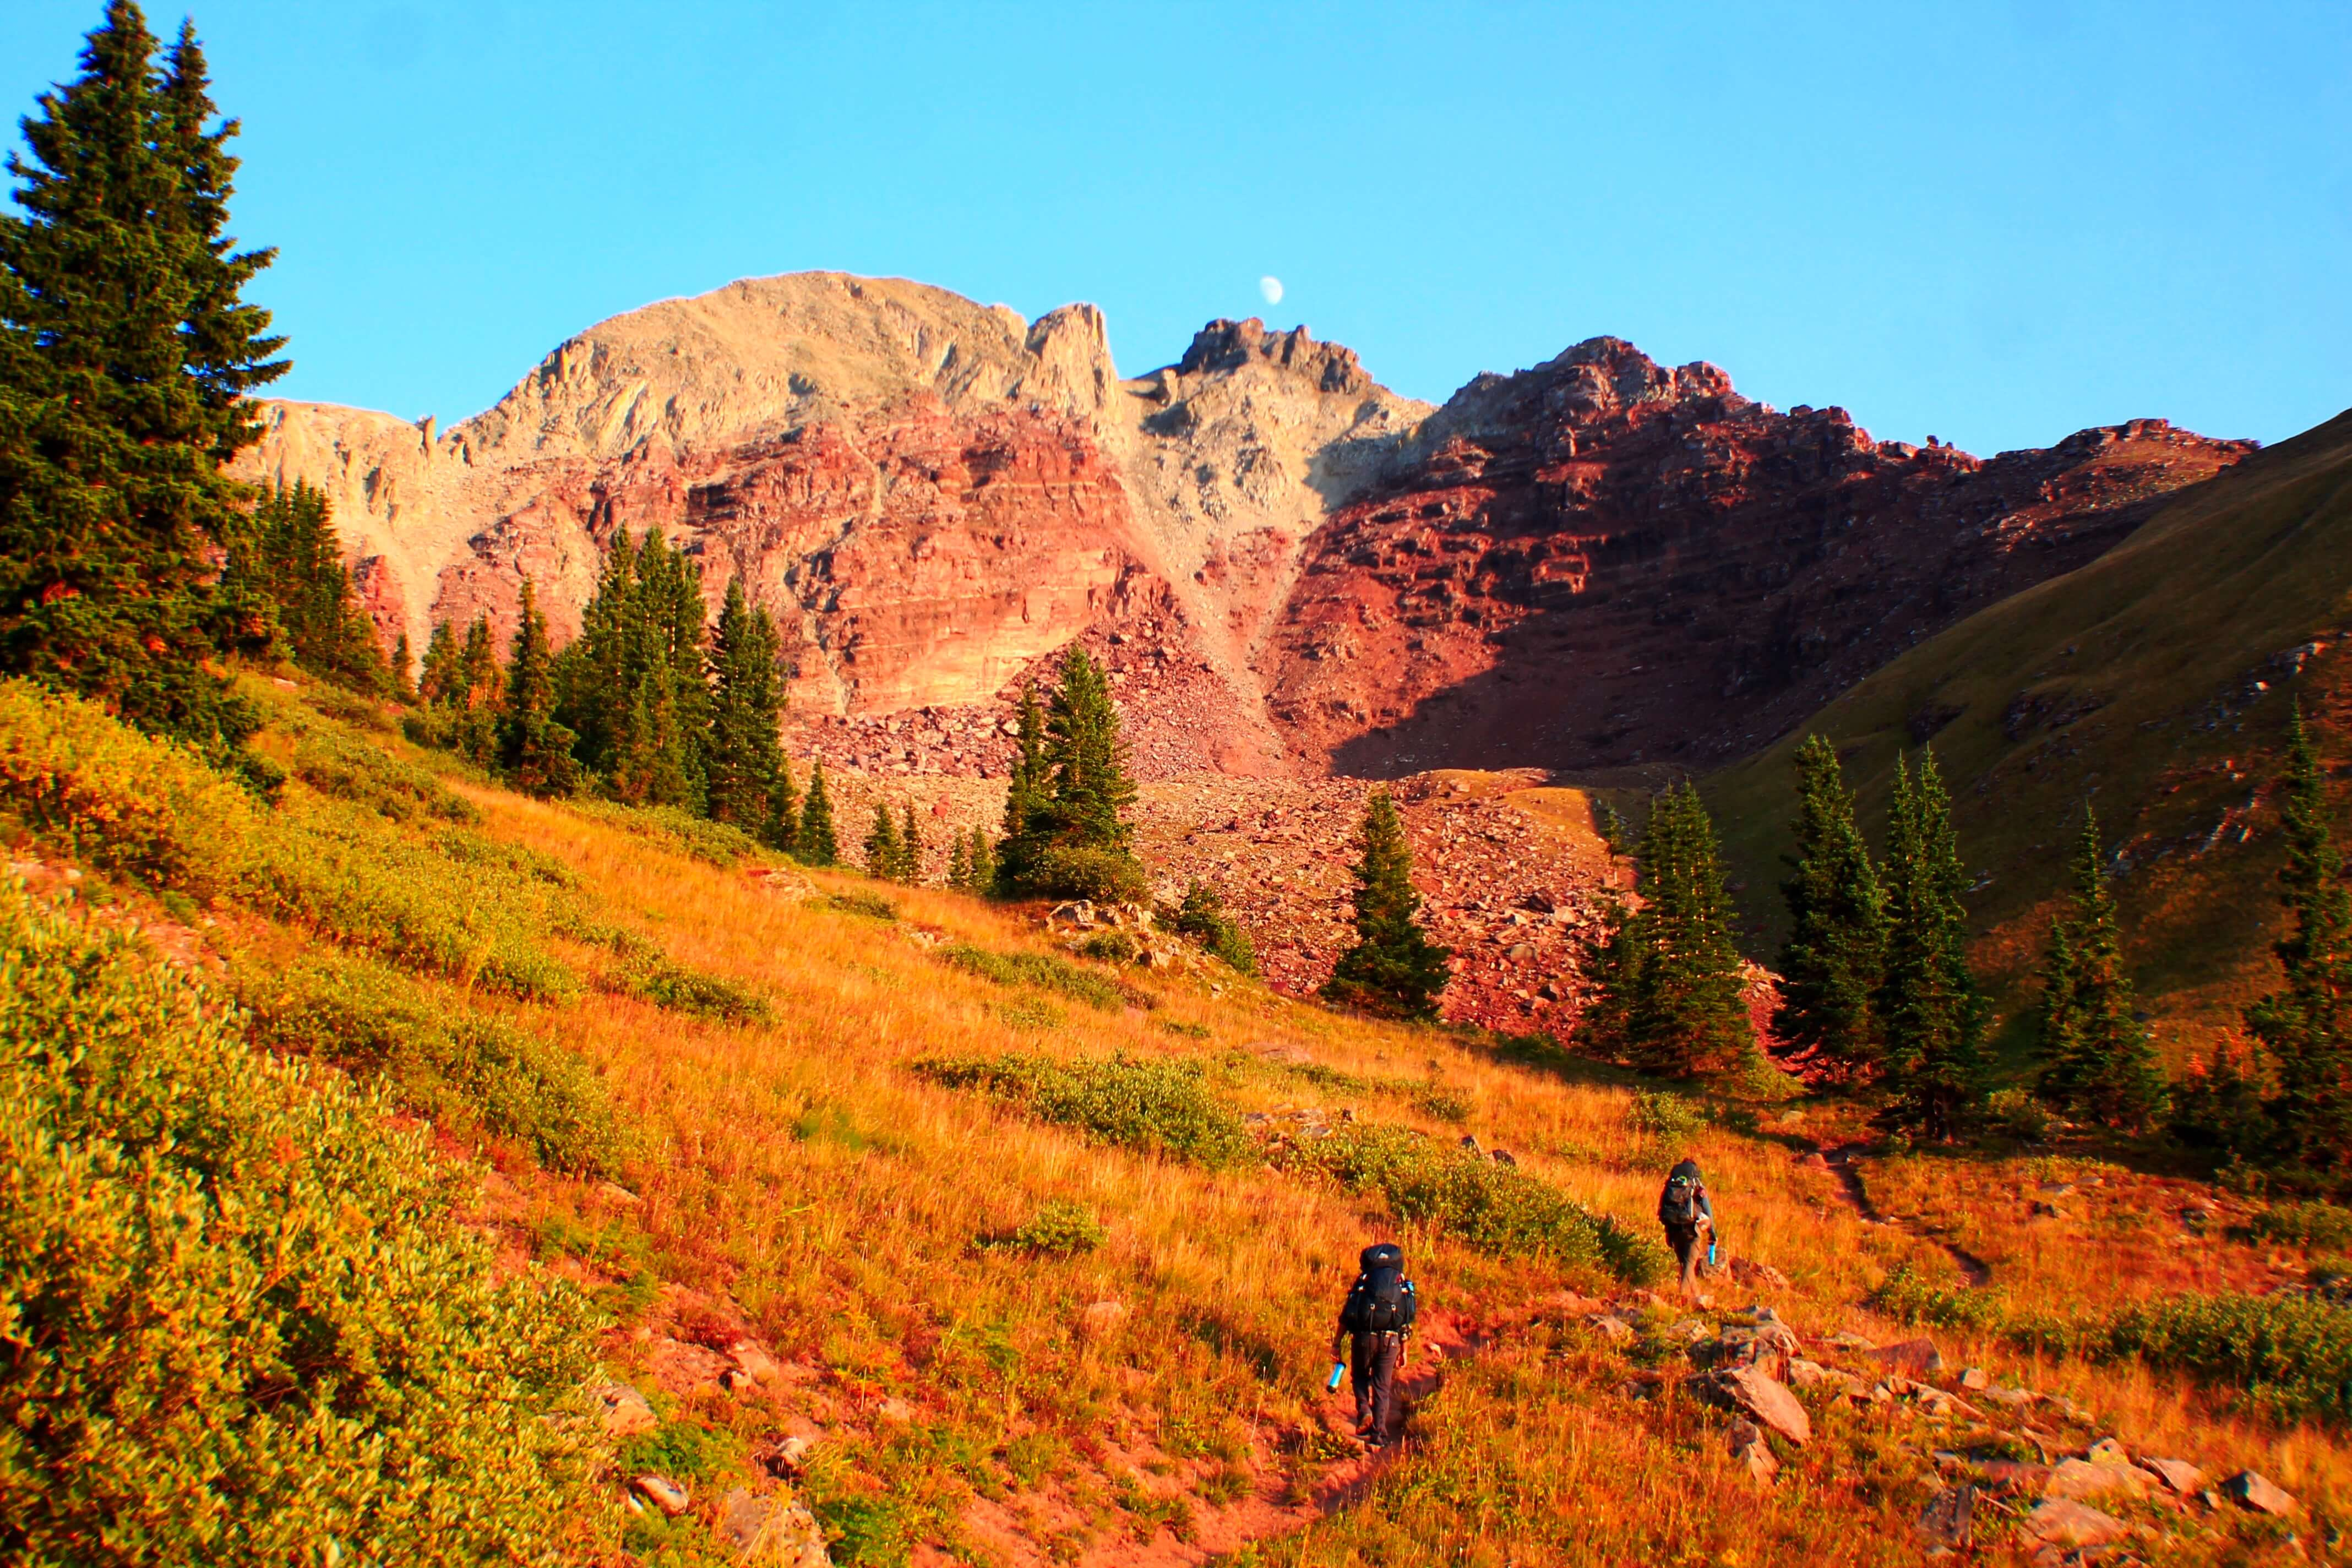 Ascending Buckskin Pass, Backpacking the Maroon Bells Four Pass Loop